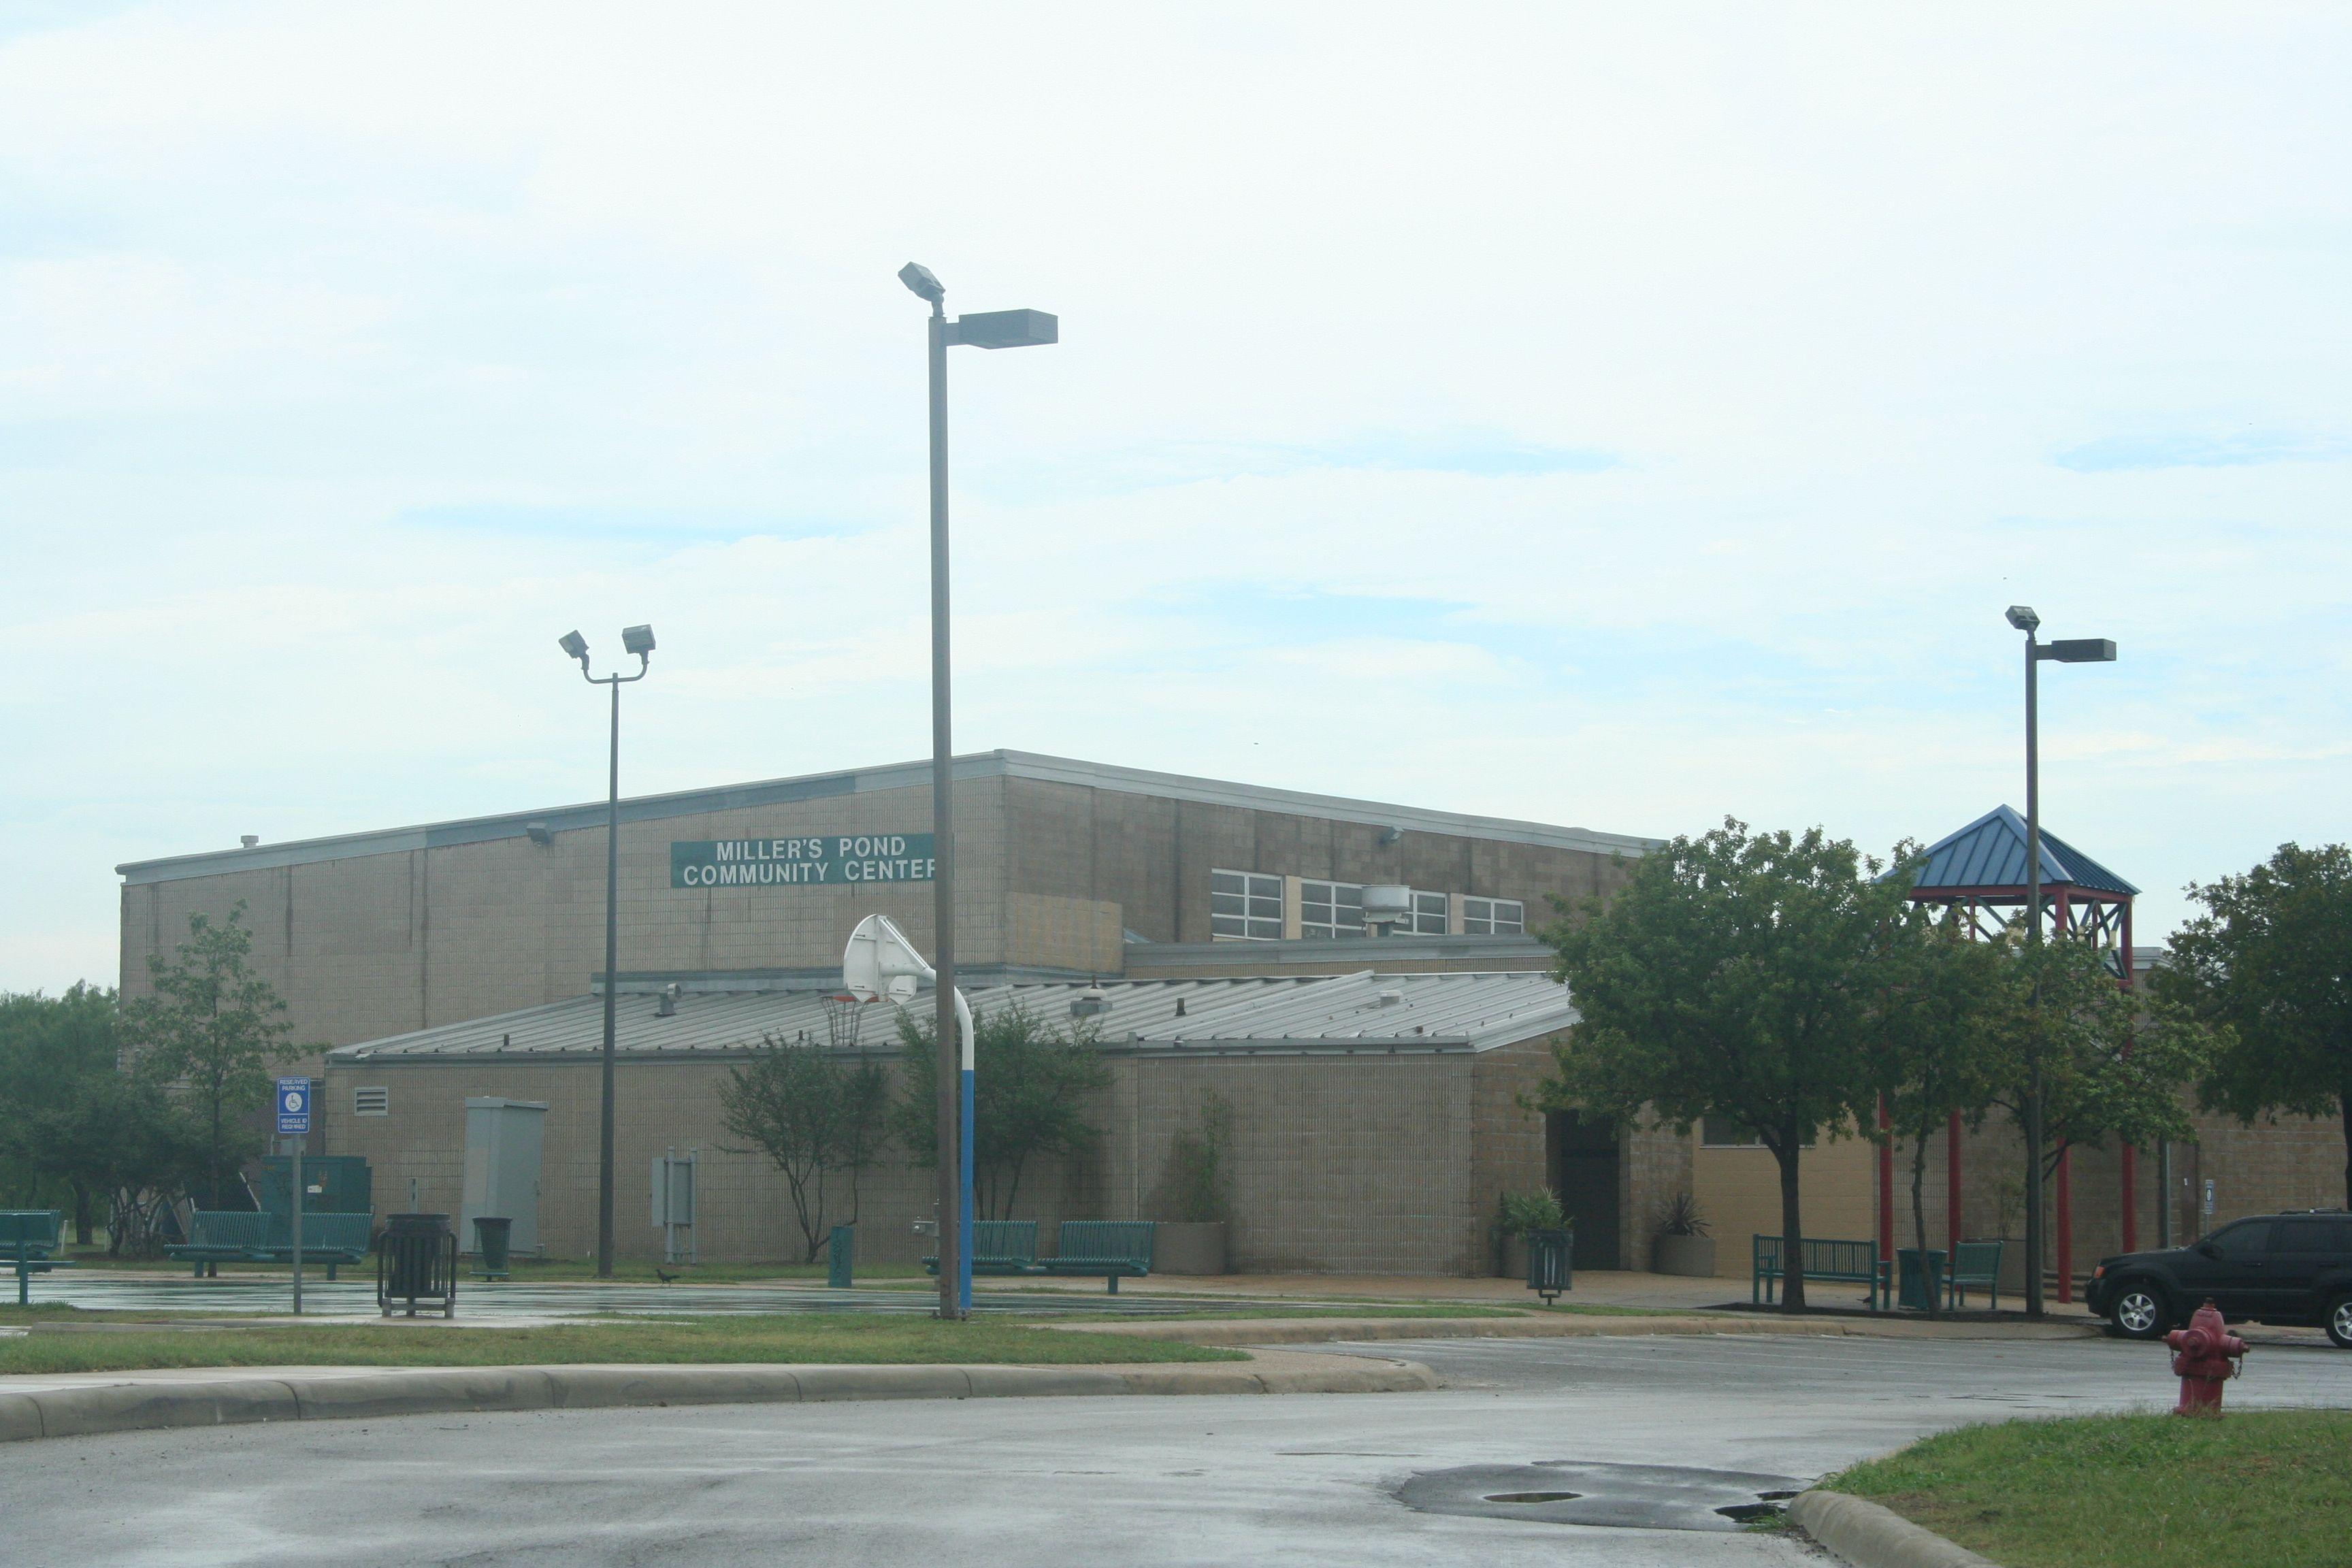 Miller's Pond Community Center - The City of San Antonio ...